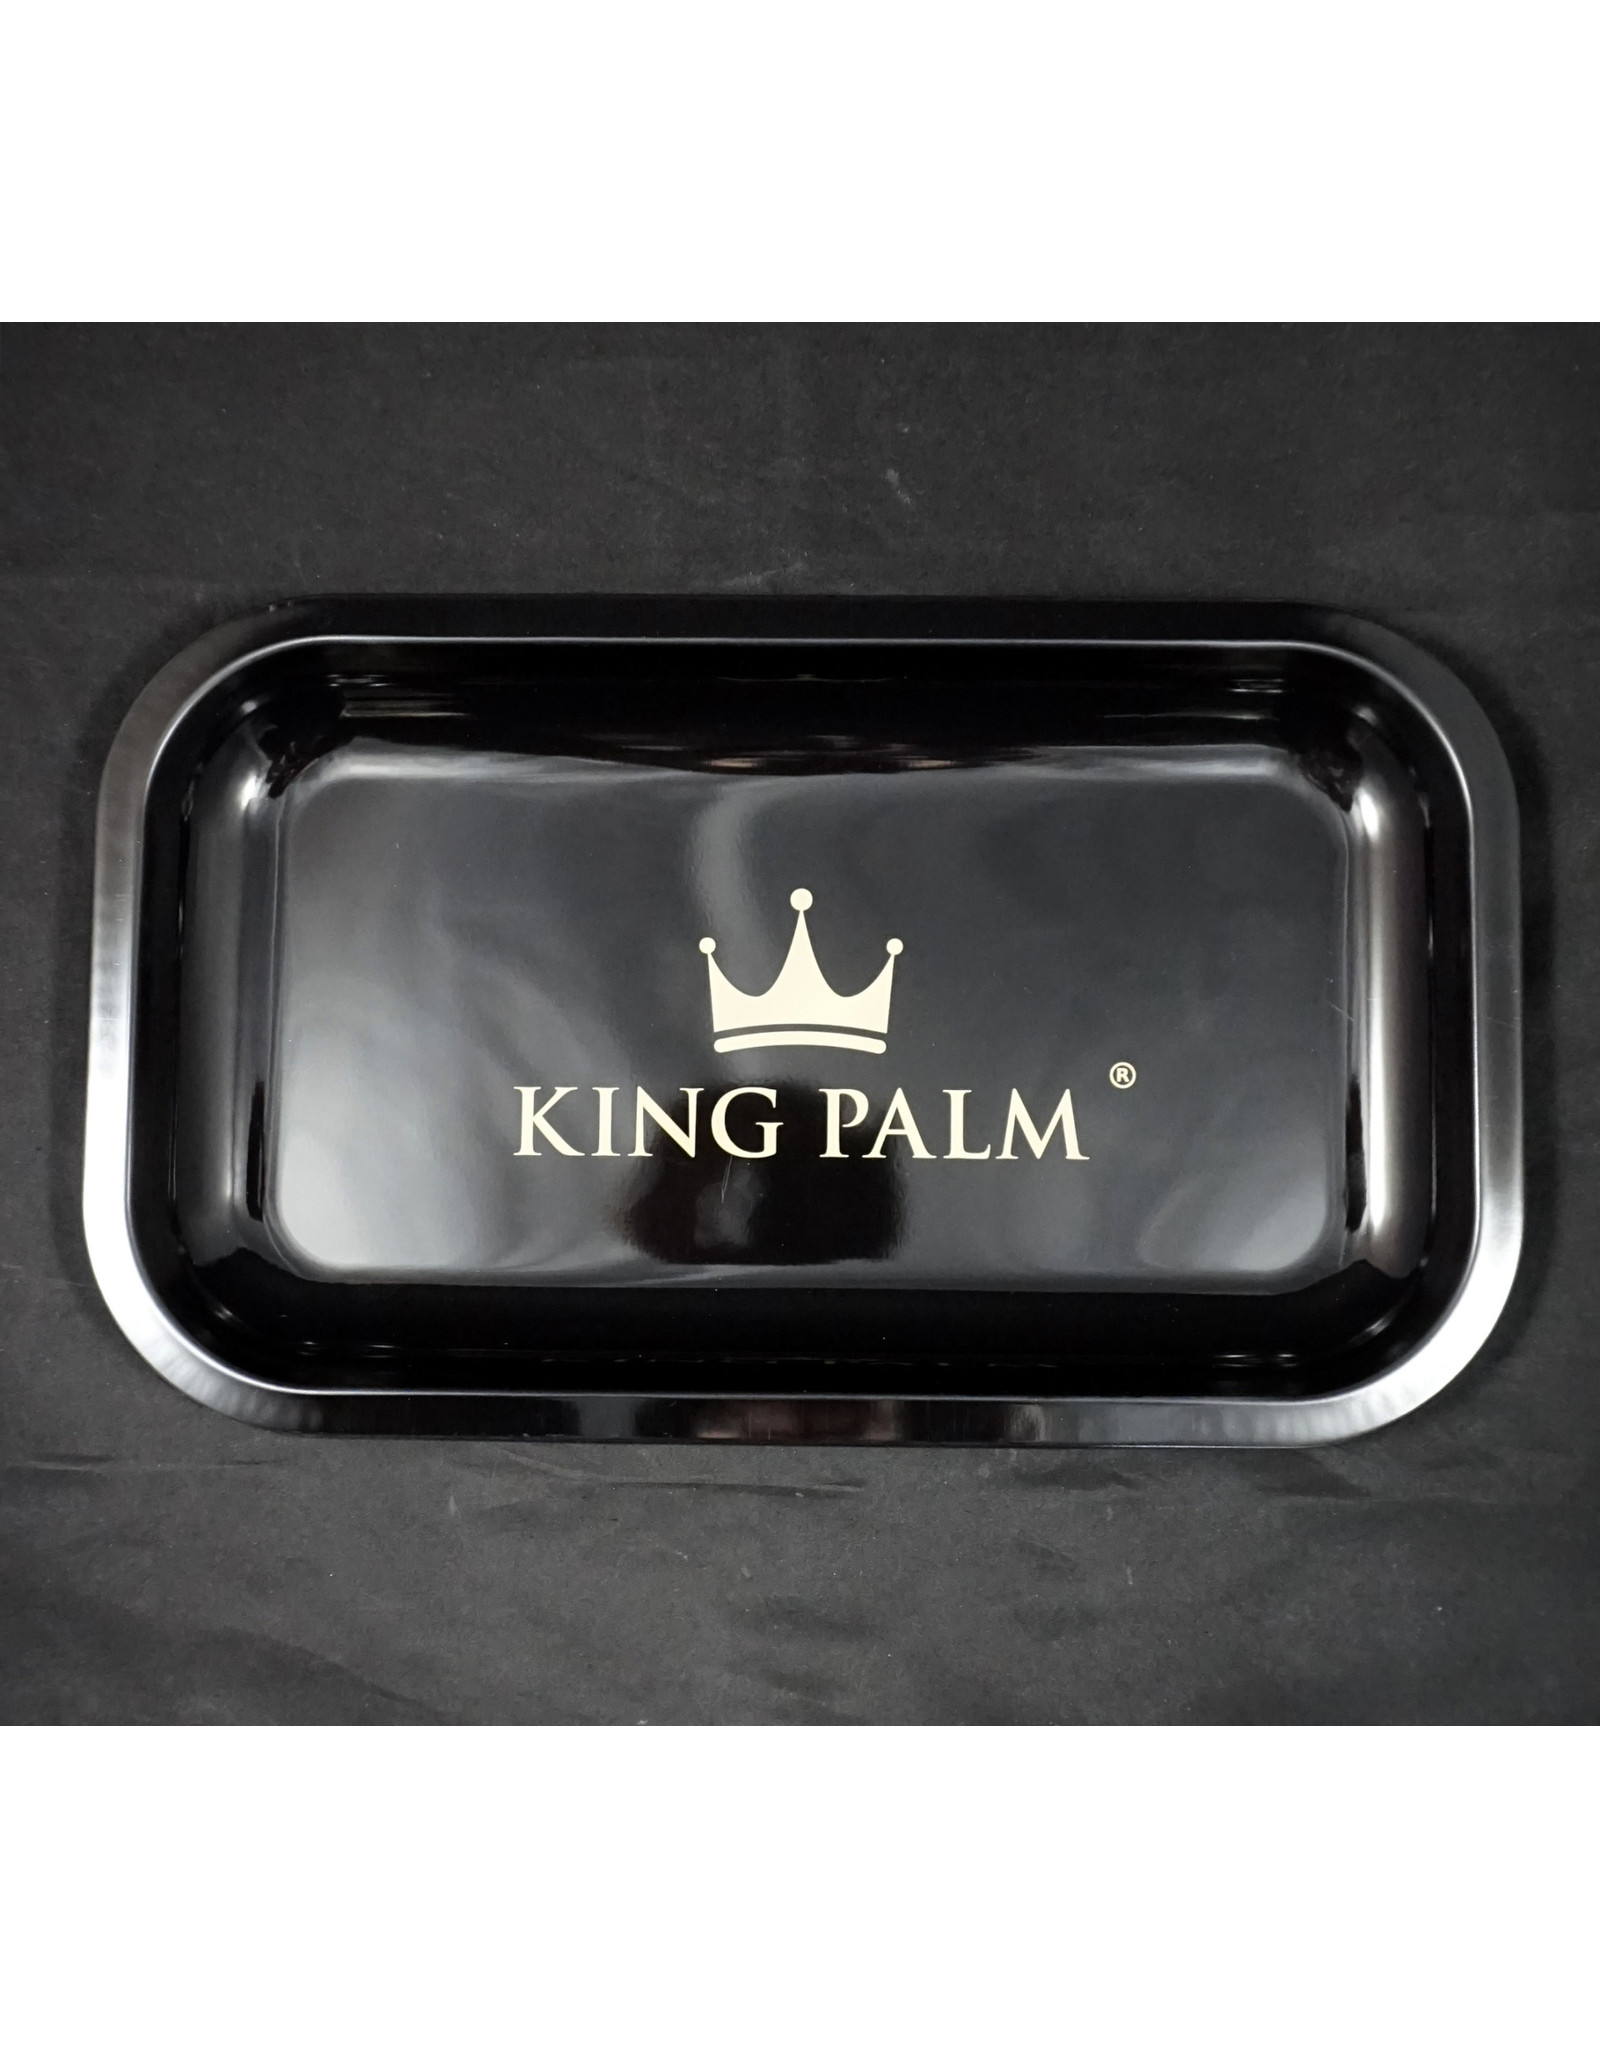 King Palm King Palm Medium Rolling Tray